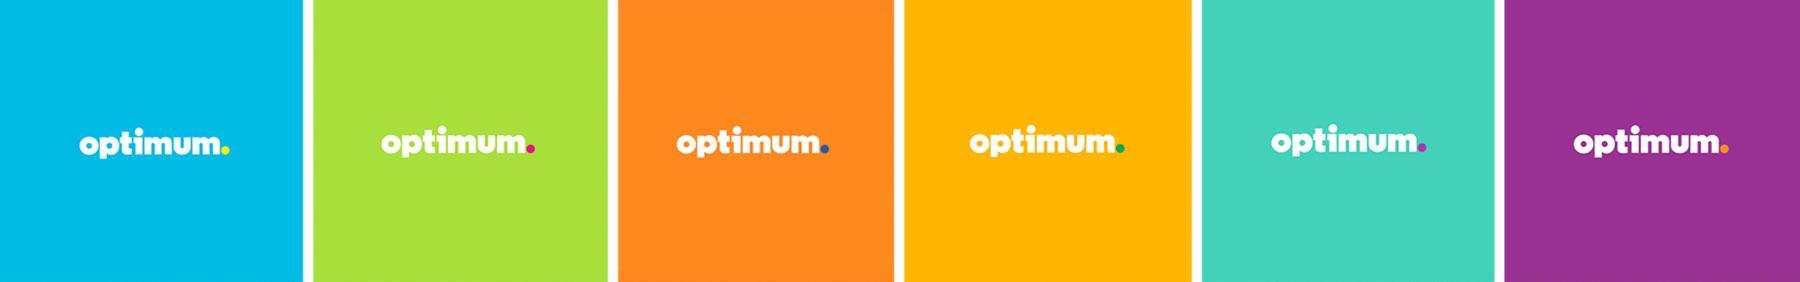 Optimum new service - FOREX Trading